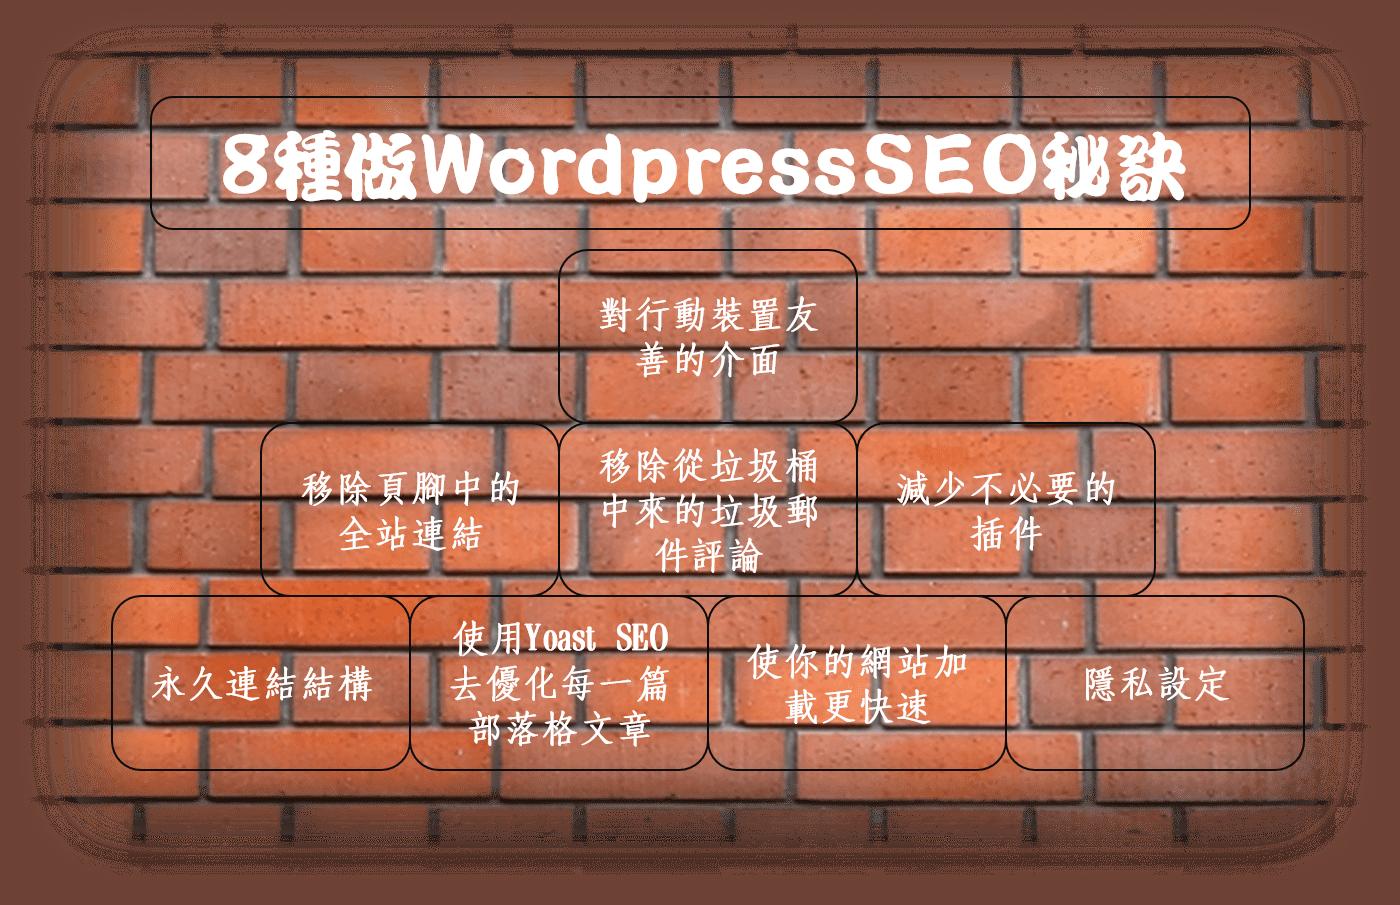 8 wordpress SEO hacks